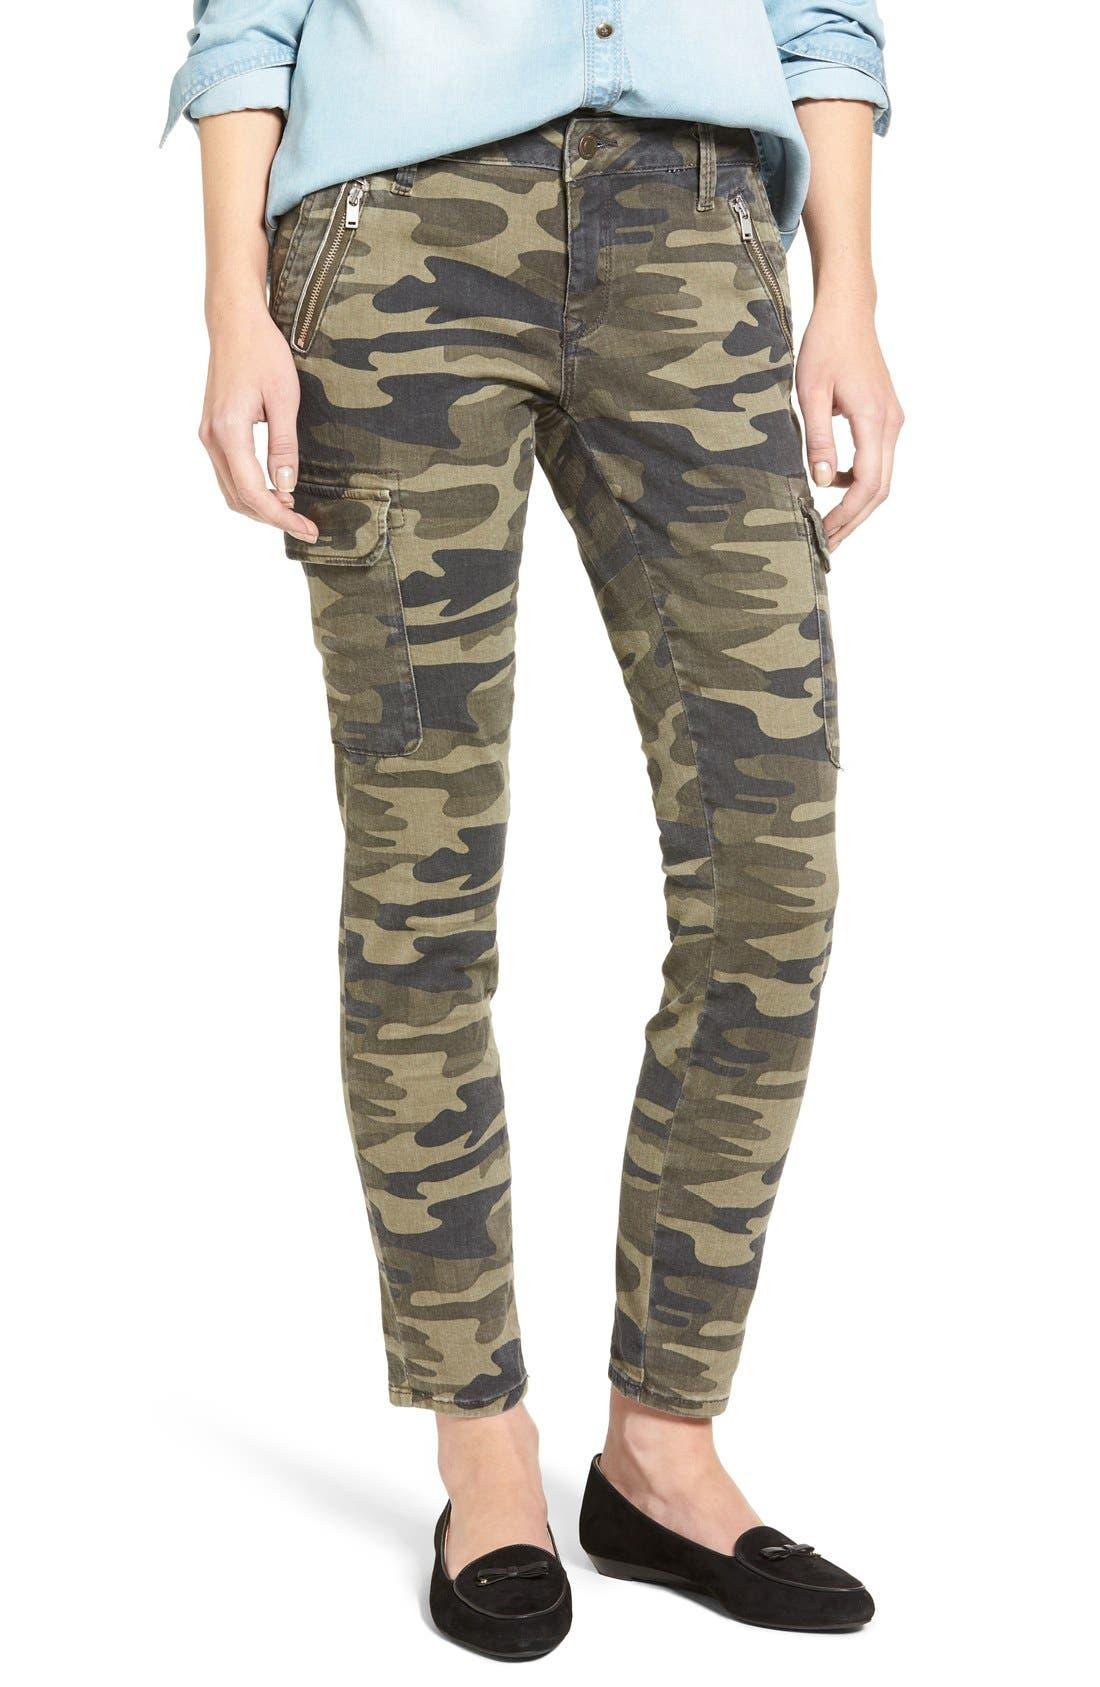 Main Image - Mavi Jeans Juliette Camo Print Military Cargo Pants